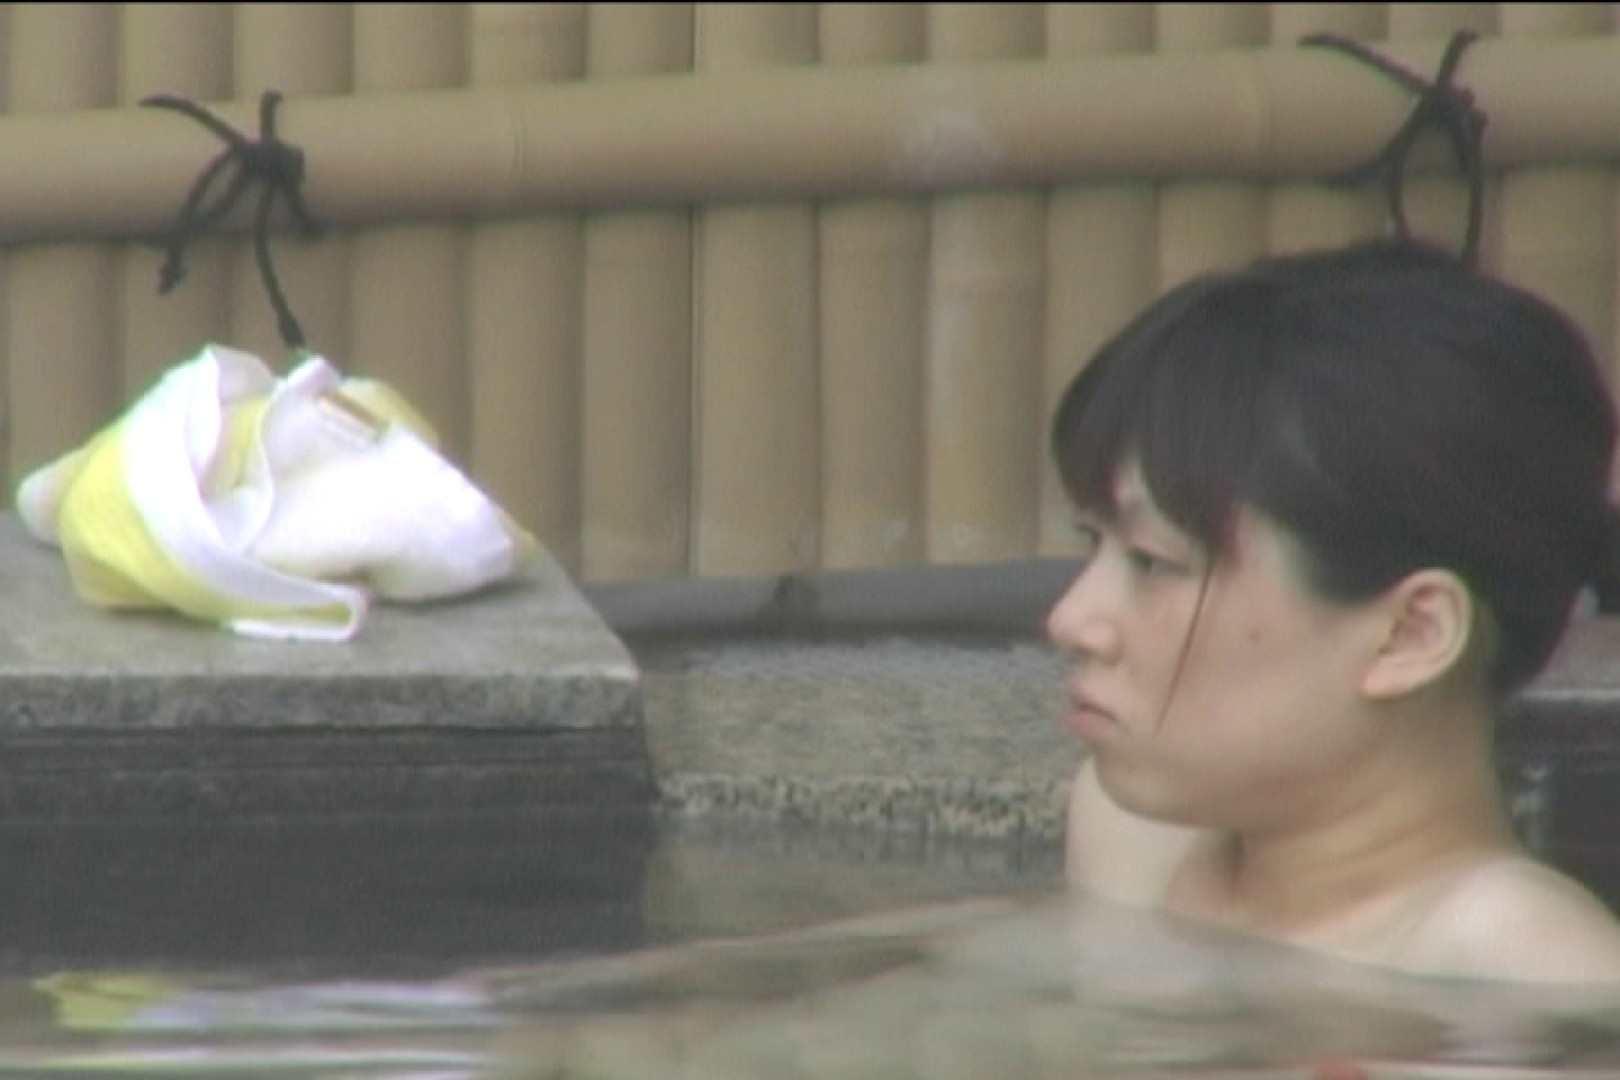 Aquaな露天風呂Vol.121 露天風呂編  82PIX 34